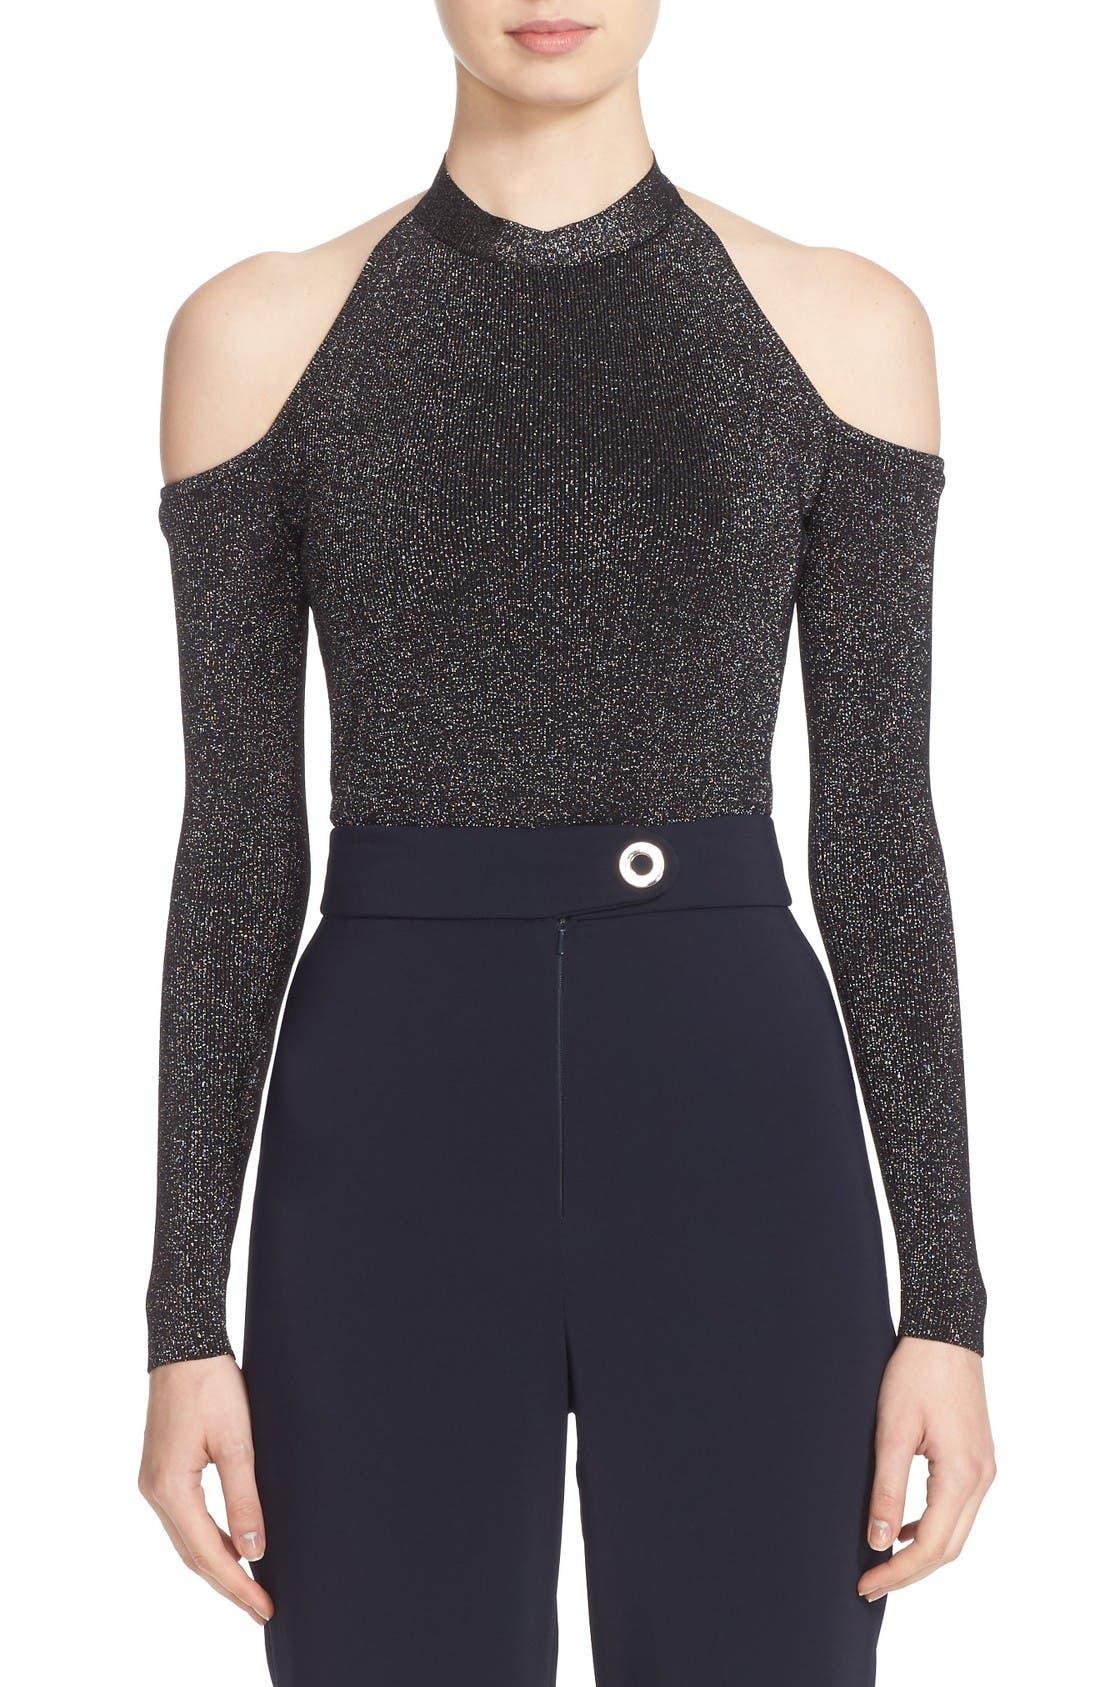 Main Image - Cushnie et Ochs Knit Cold Shoulder Bodysuit